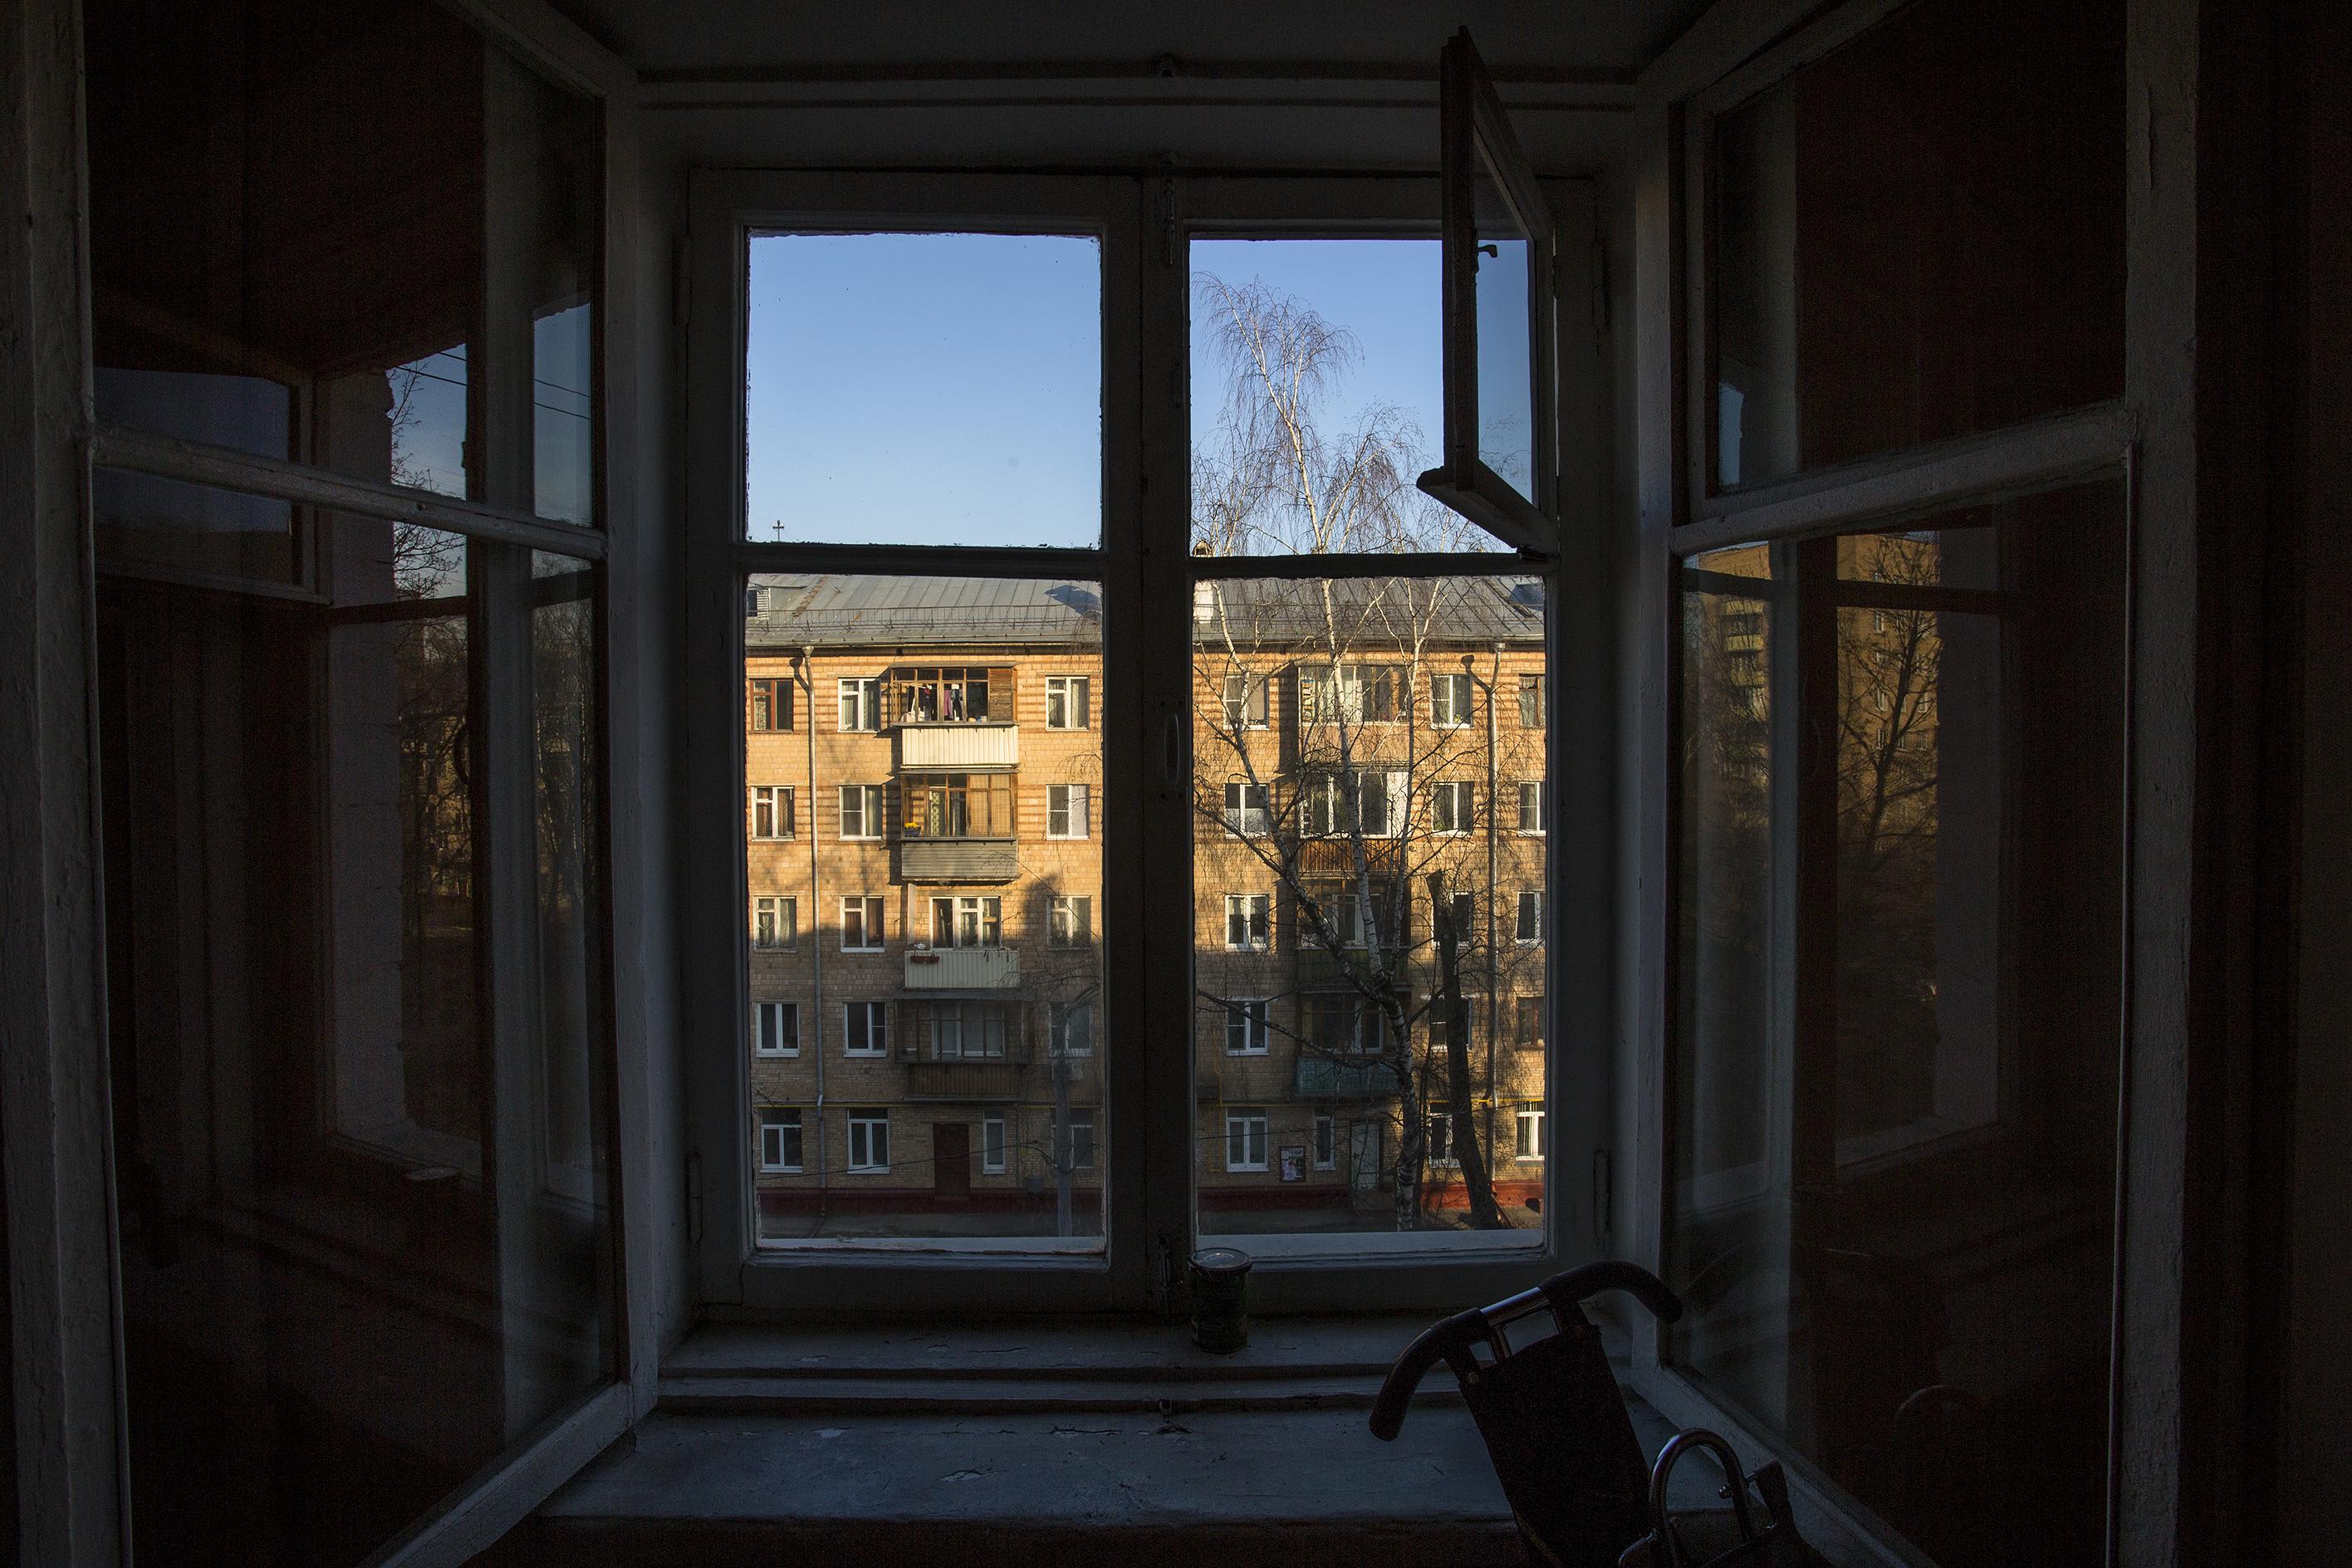 Journal de la quarantaine, 27 mars 2020, Jour 9 © Kseniya Yablonskaya